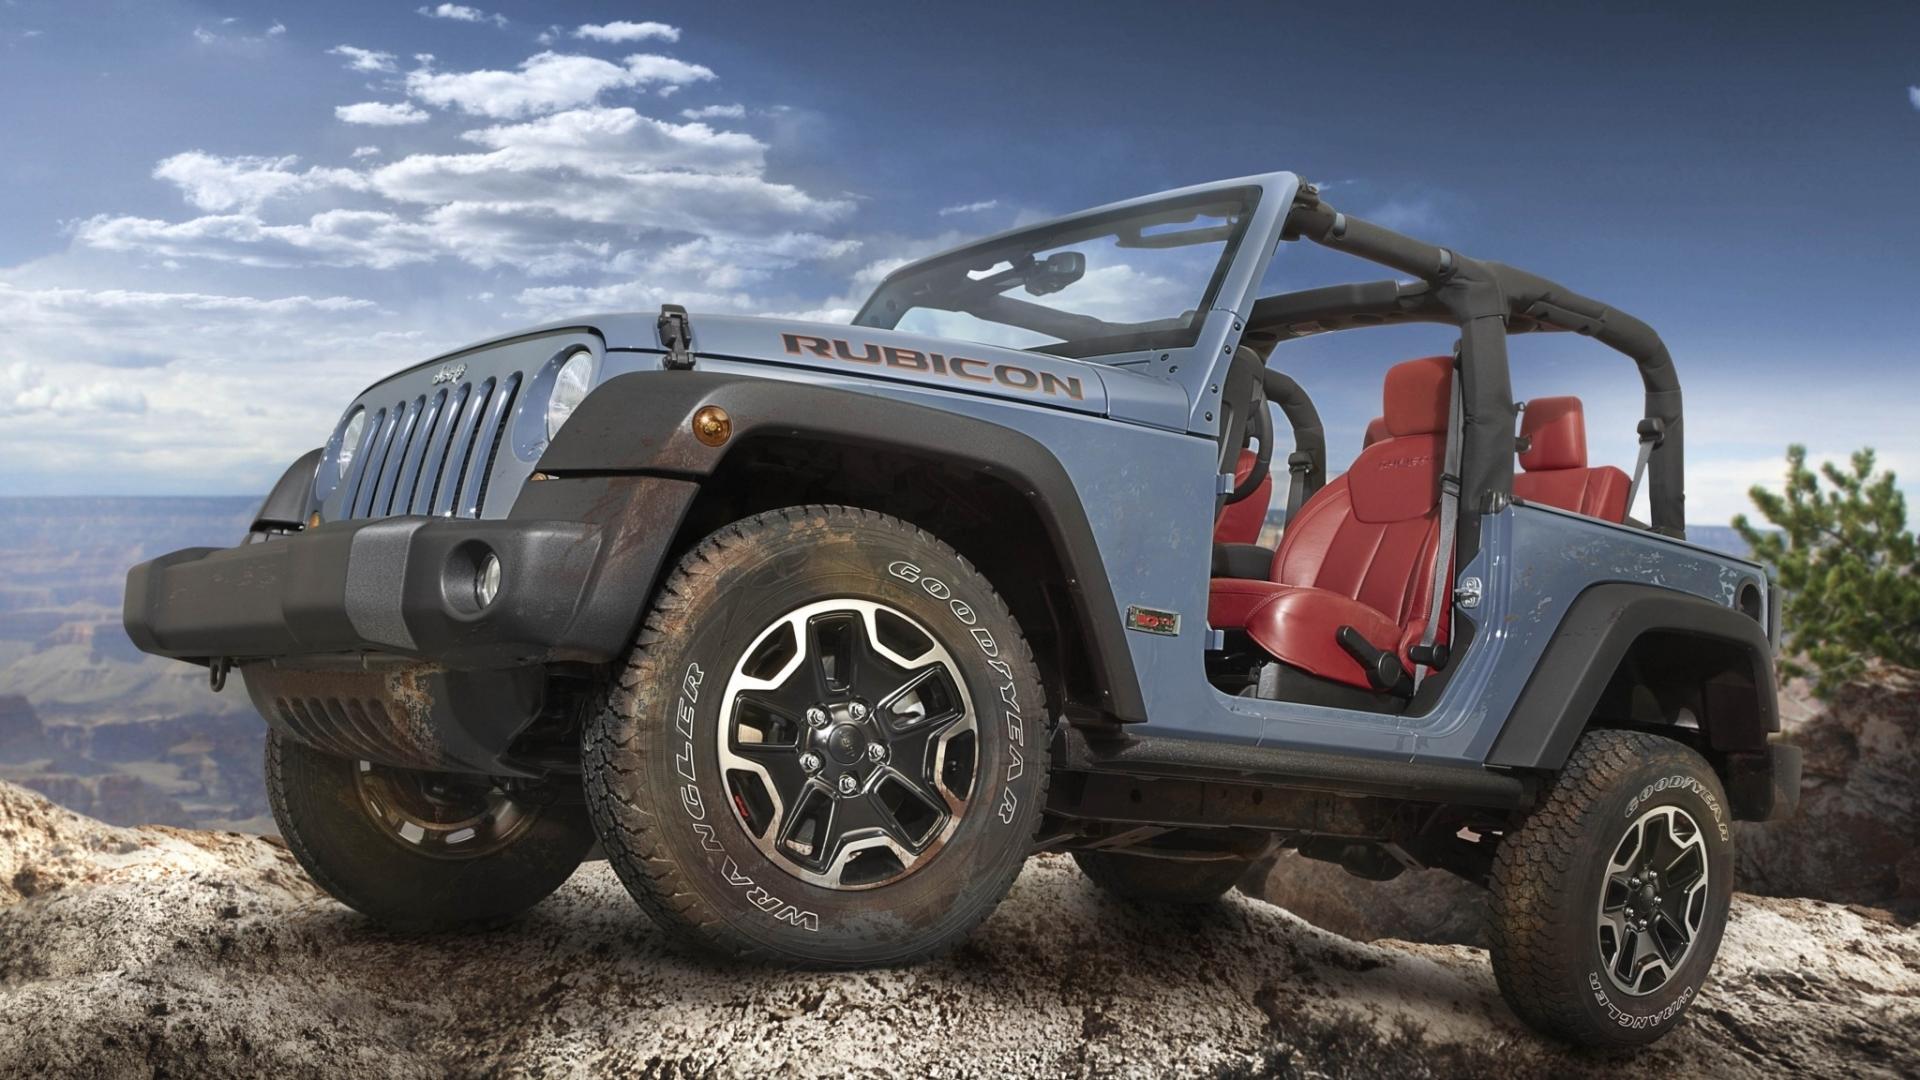 Jeep Wrangler Top View >> 改装吉普牧马人jeep图片壁纸_汽车图片